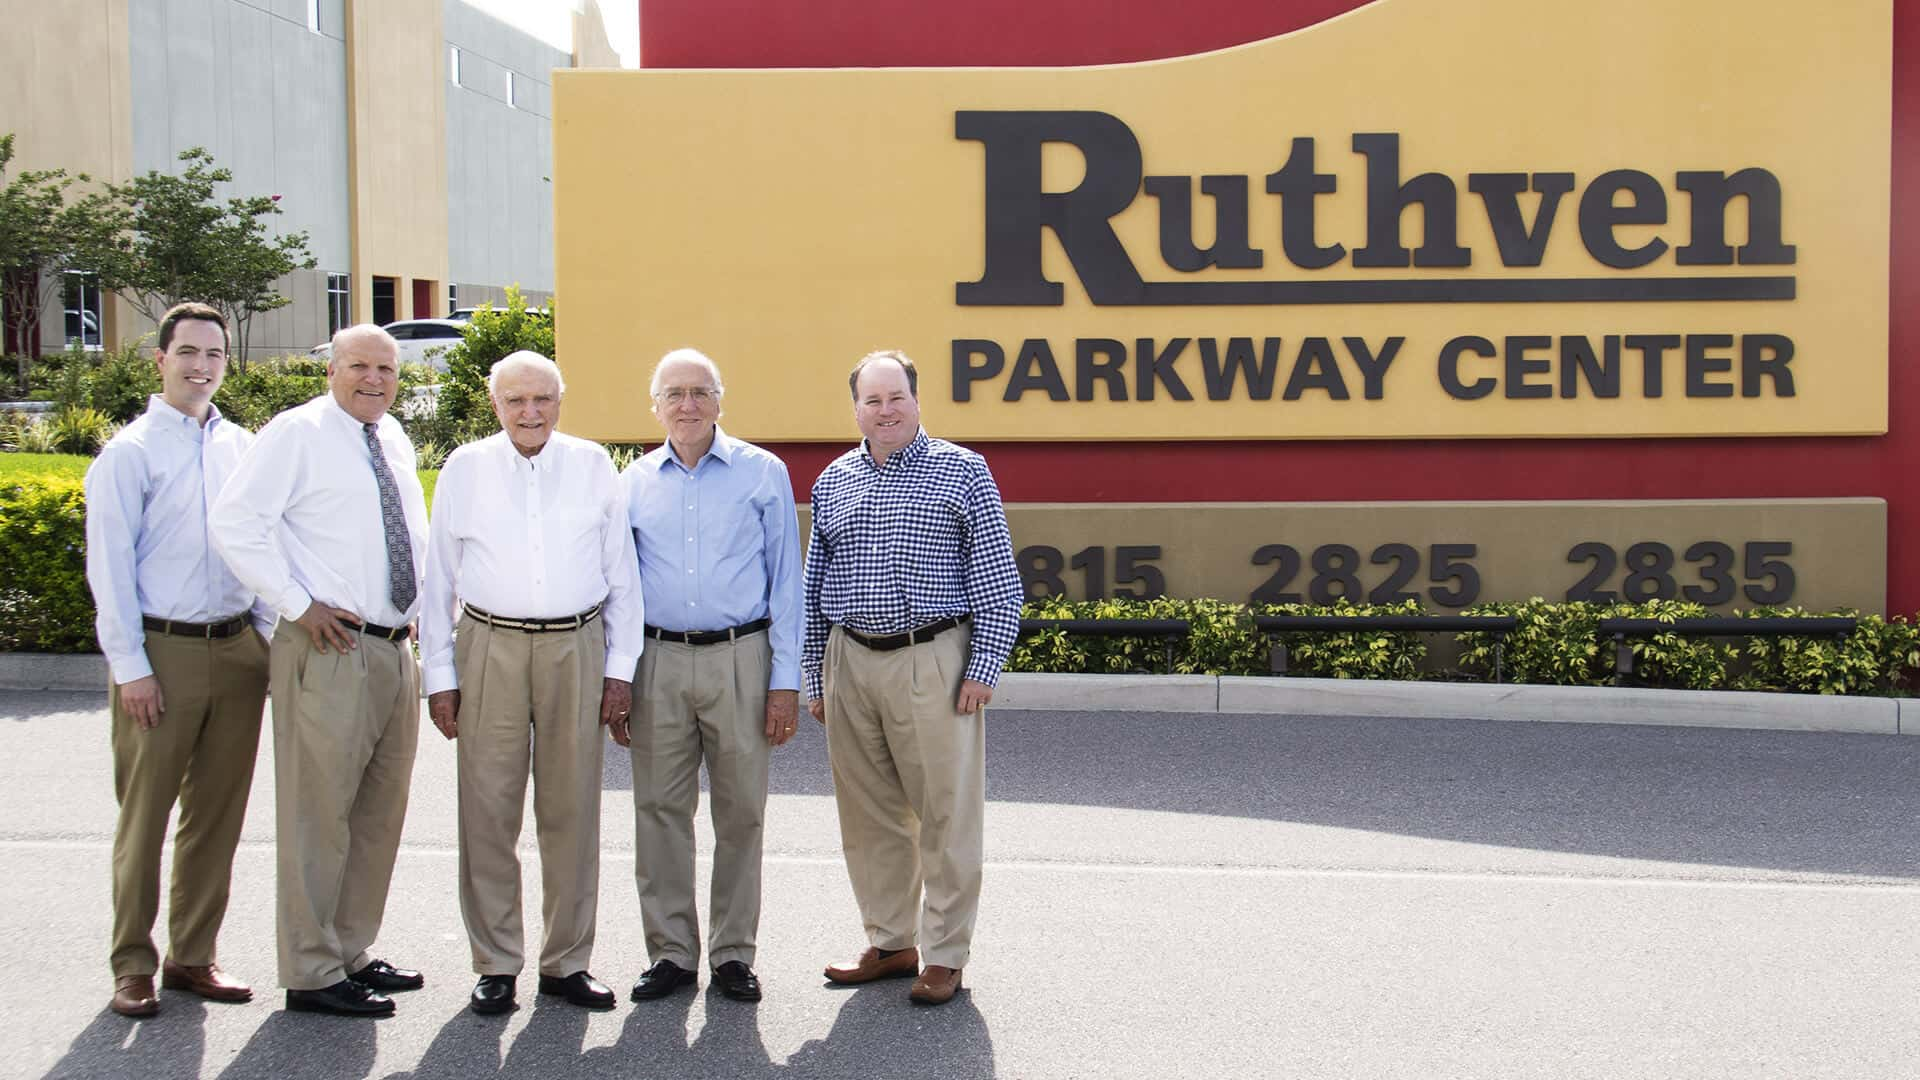 The Ruthvens